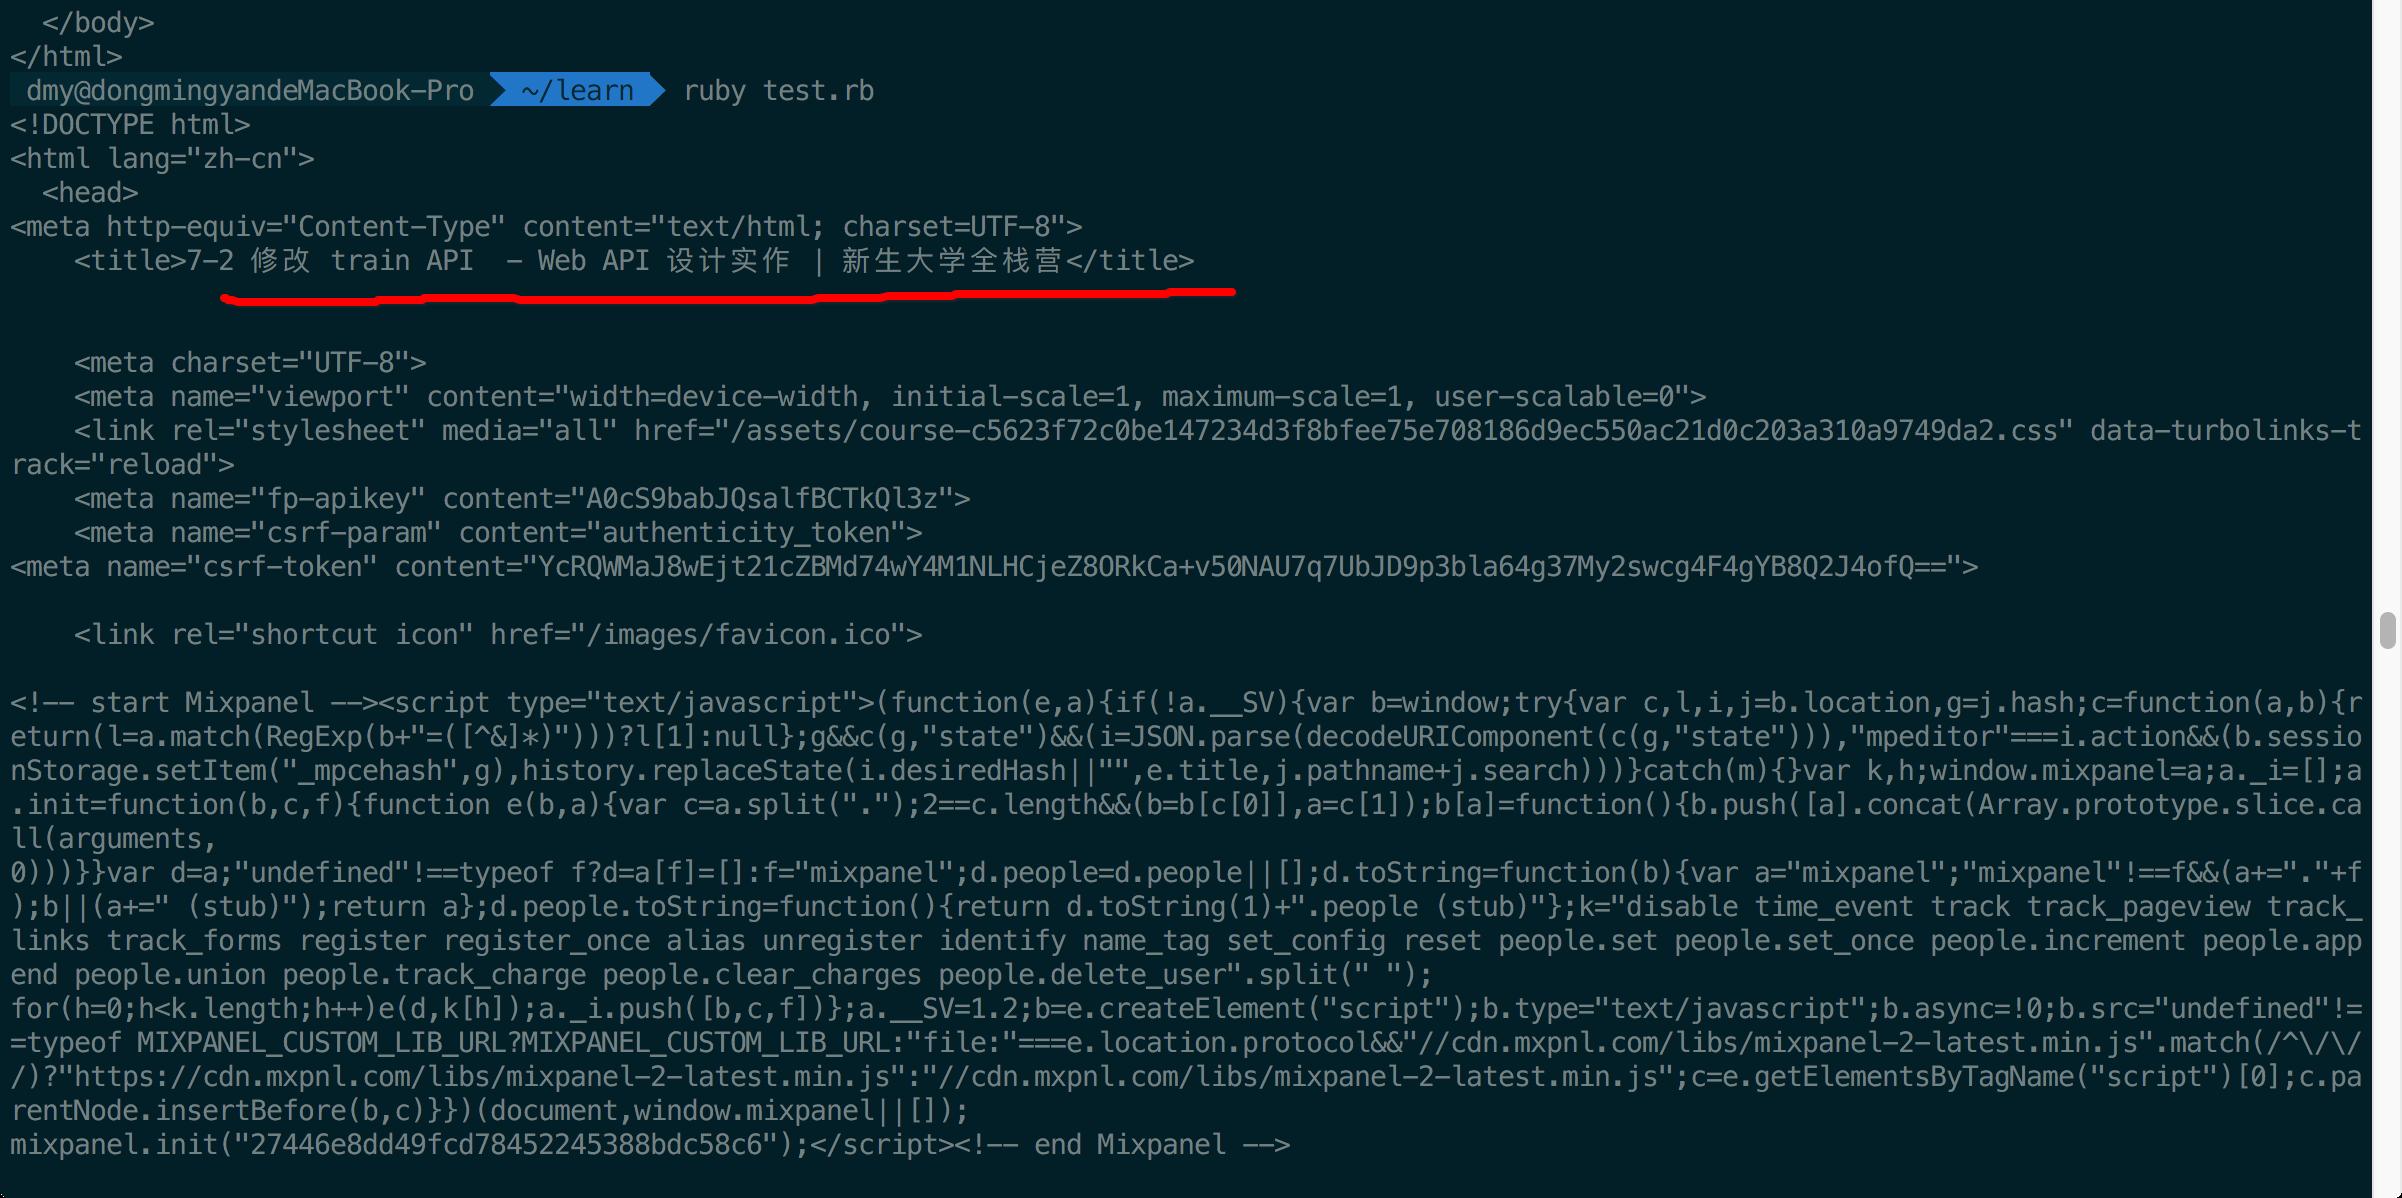 ruby如何抓取html并转换成pdf? « dmy's Blog